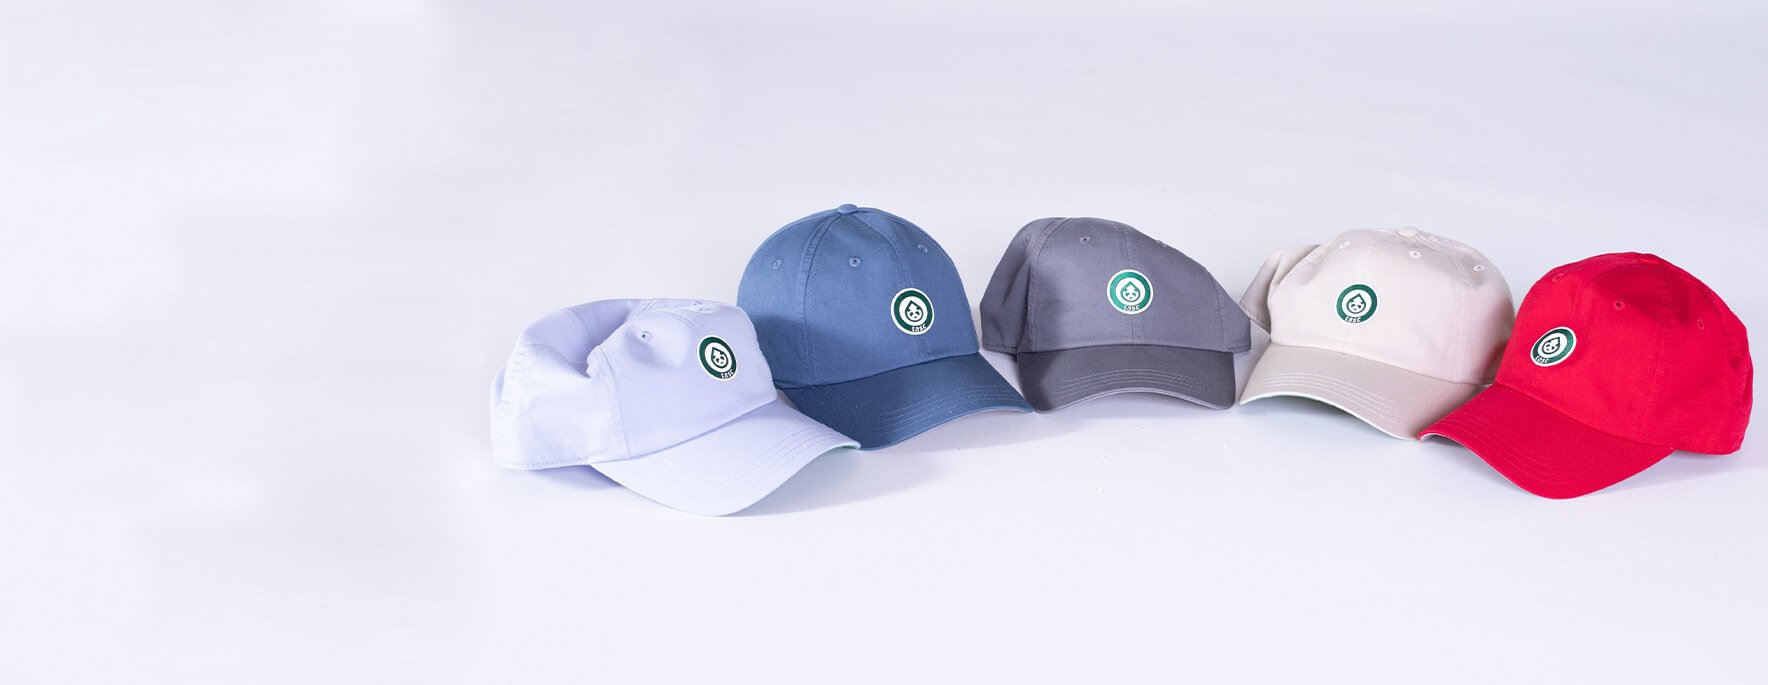 Men's hats and belts - tasc Performance